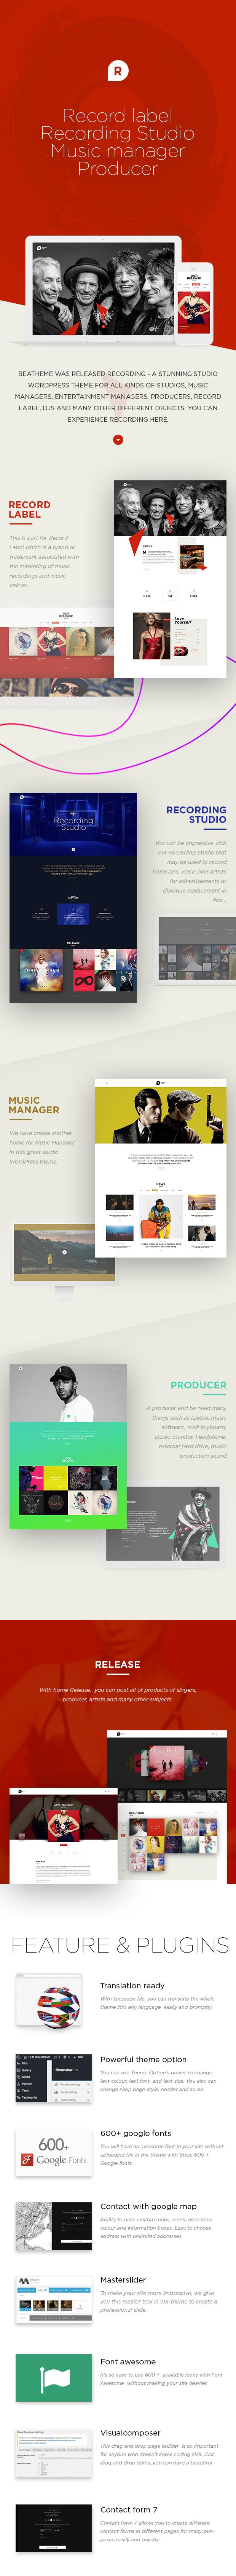 Recording Studio WordPress Theme - DJ / Producer / Music / Soundtrack / Artist / Entertainment - 1